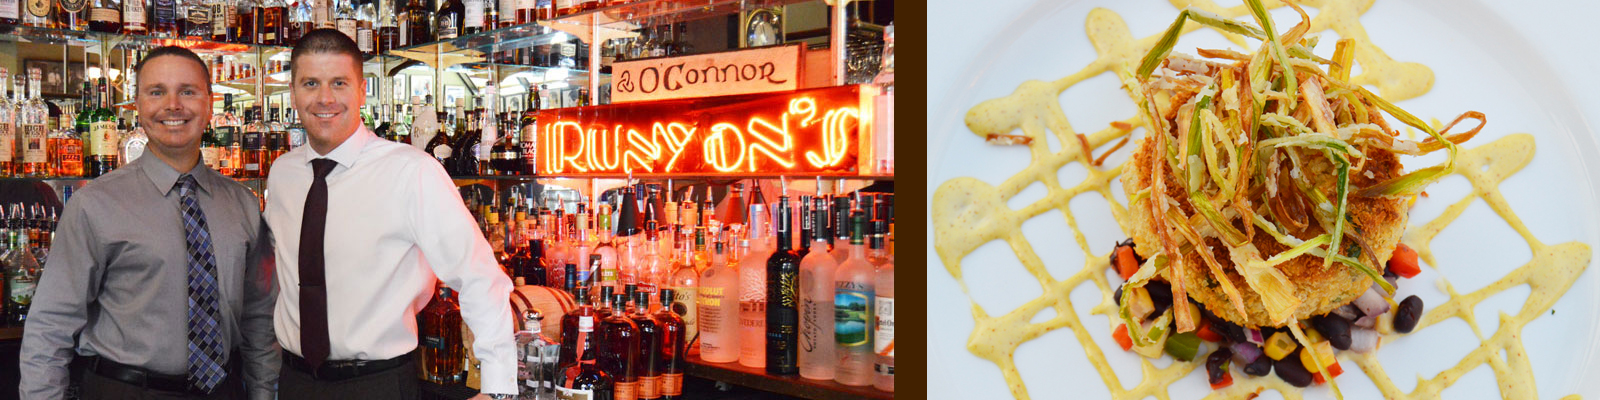 runyons bar and crab cake